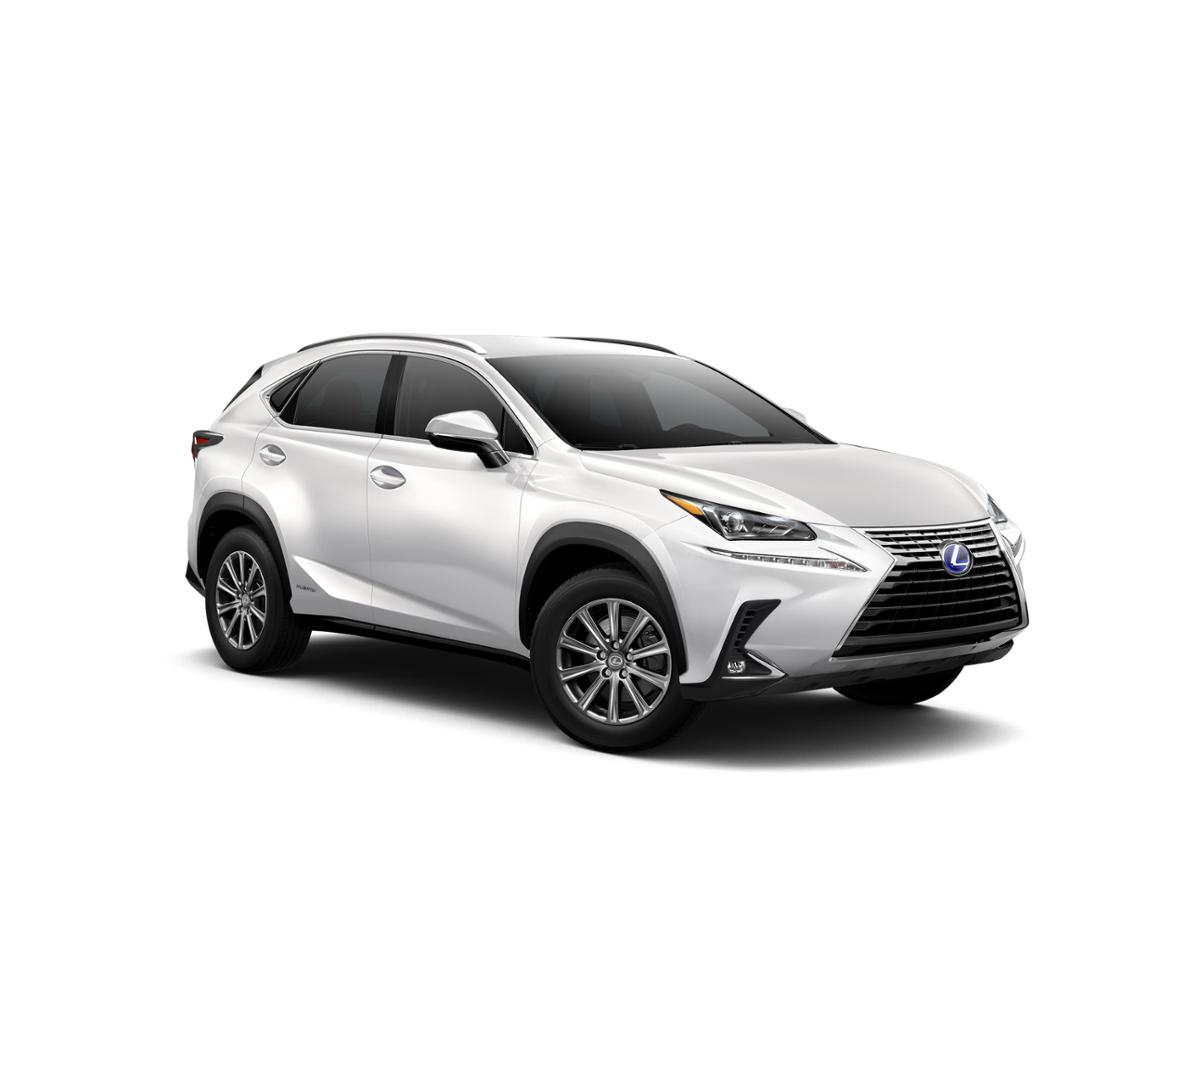 2018 lexus nx 300h rockville md lexus of rockville for Toyota motor credit corporation atlanta